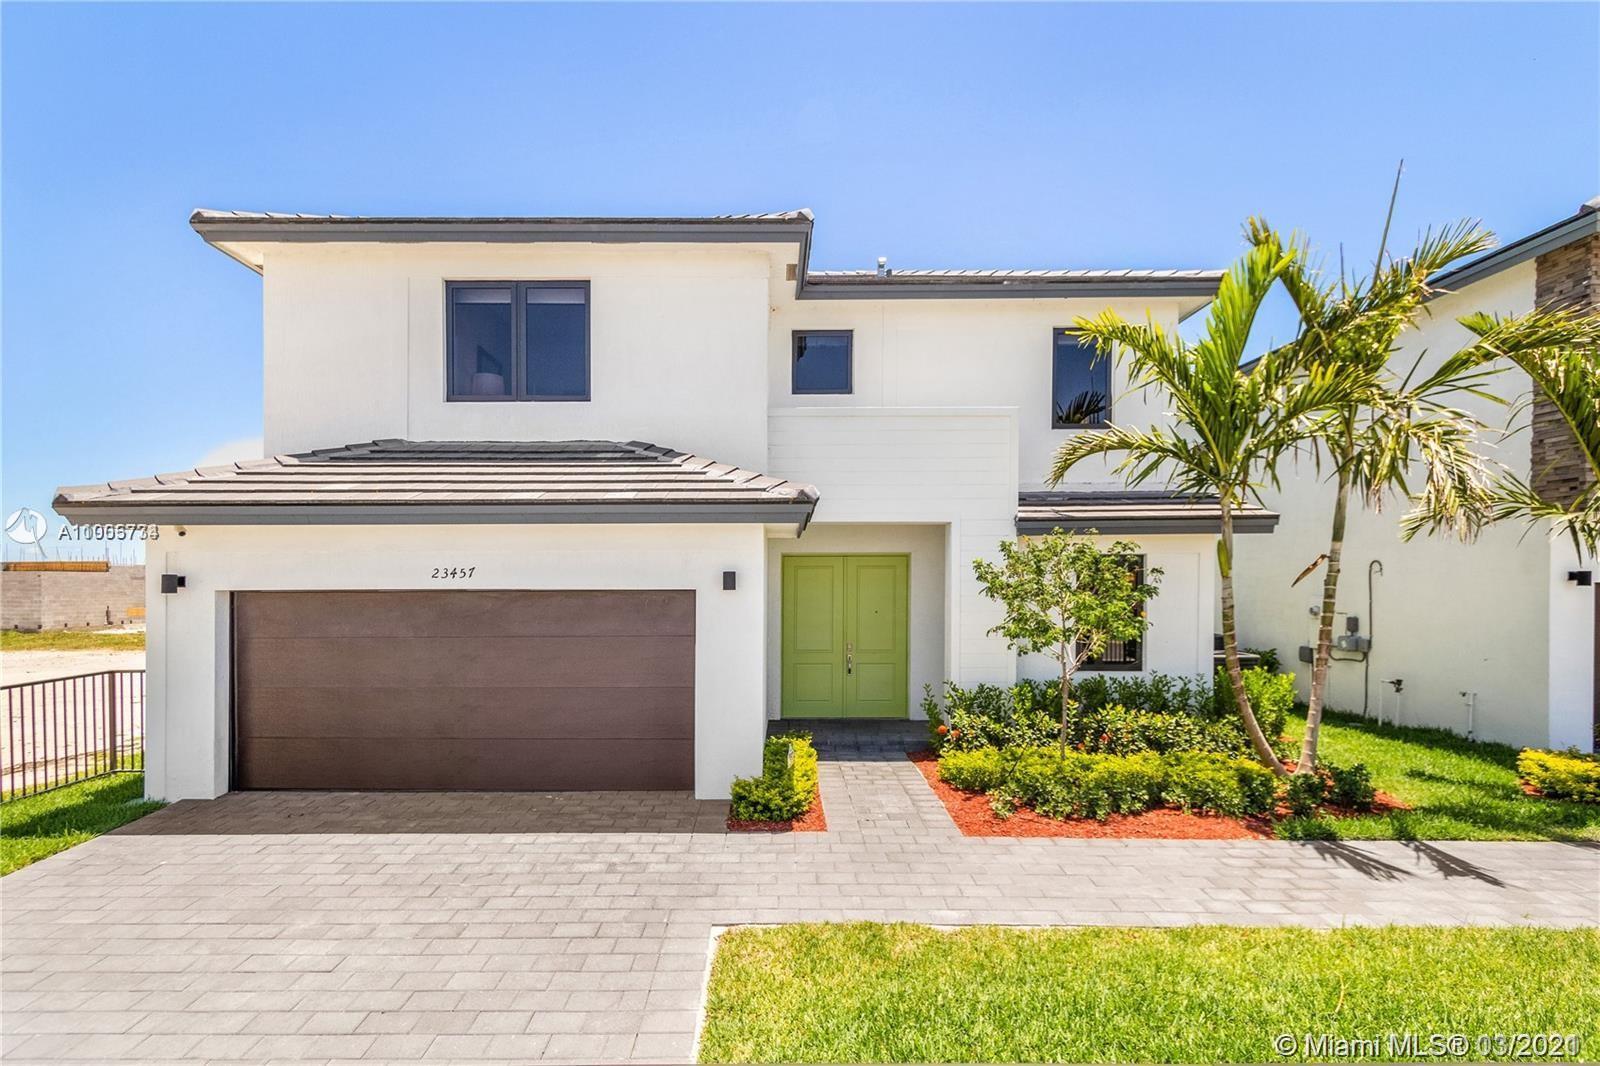 23457 Sw 108th Ct Property Photo